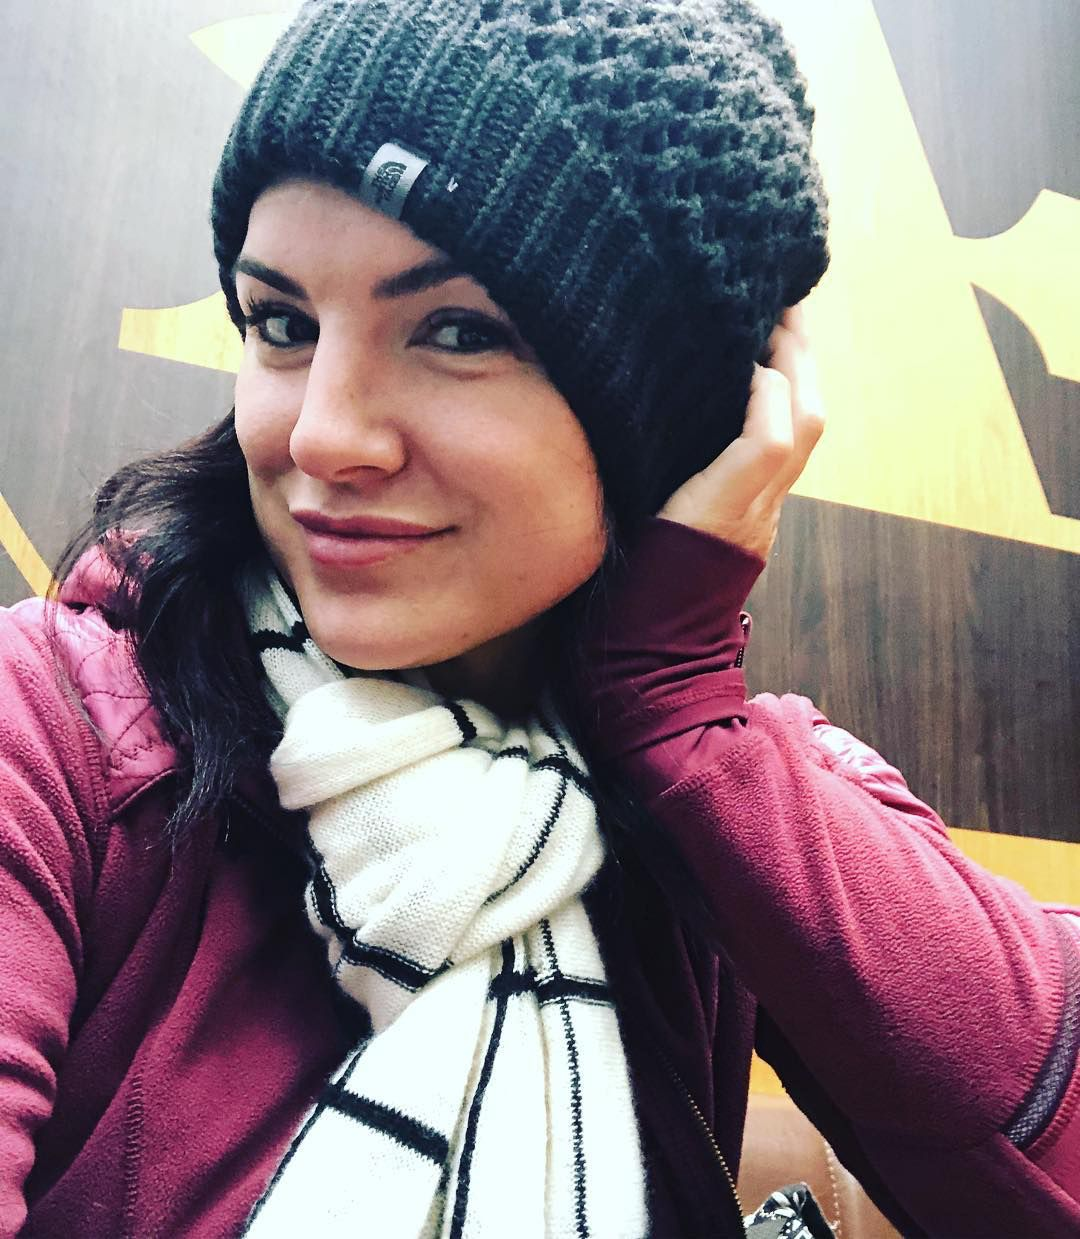 Gina Carano (Instagram). | Turn ons, Women, Winter hats